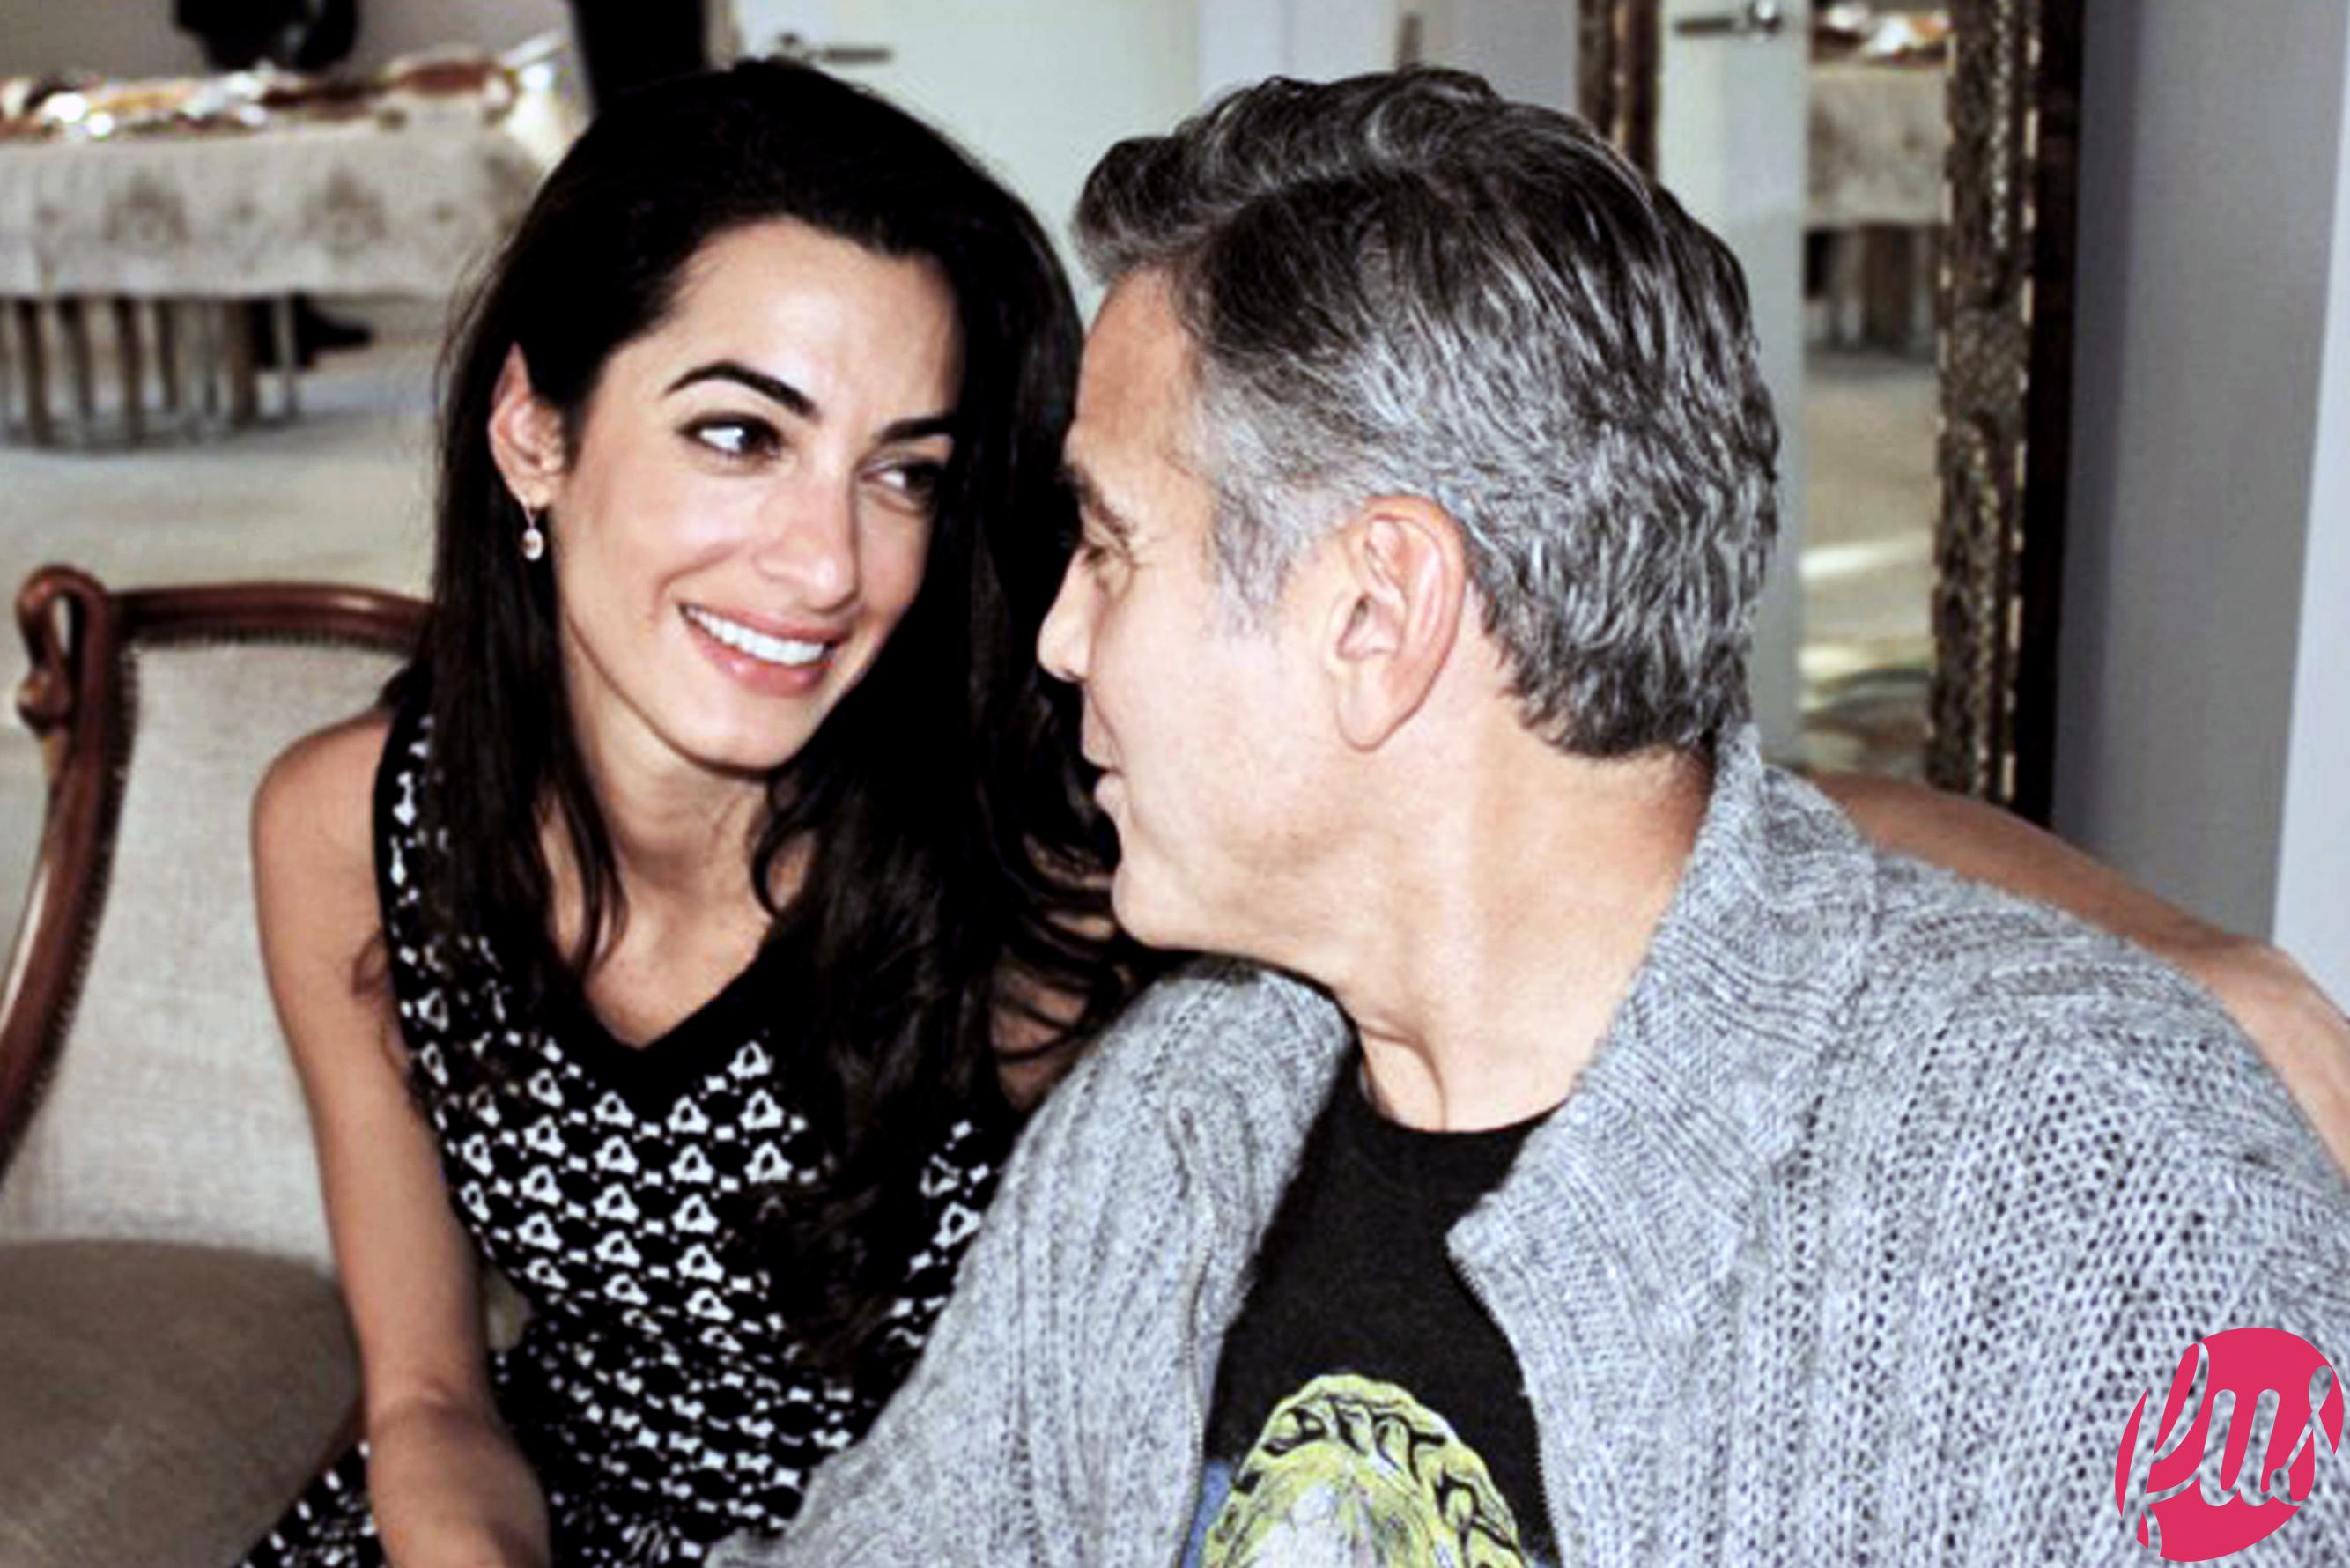 George Clooney in Tanzania